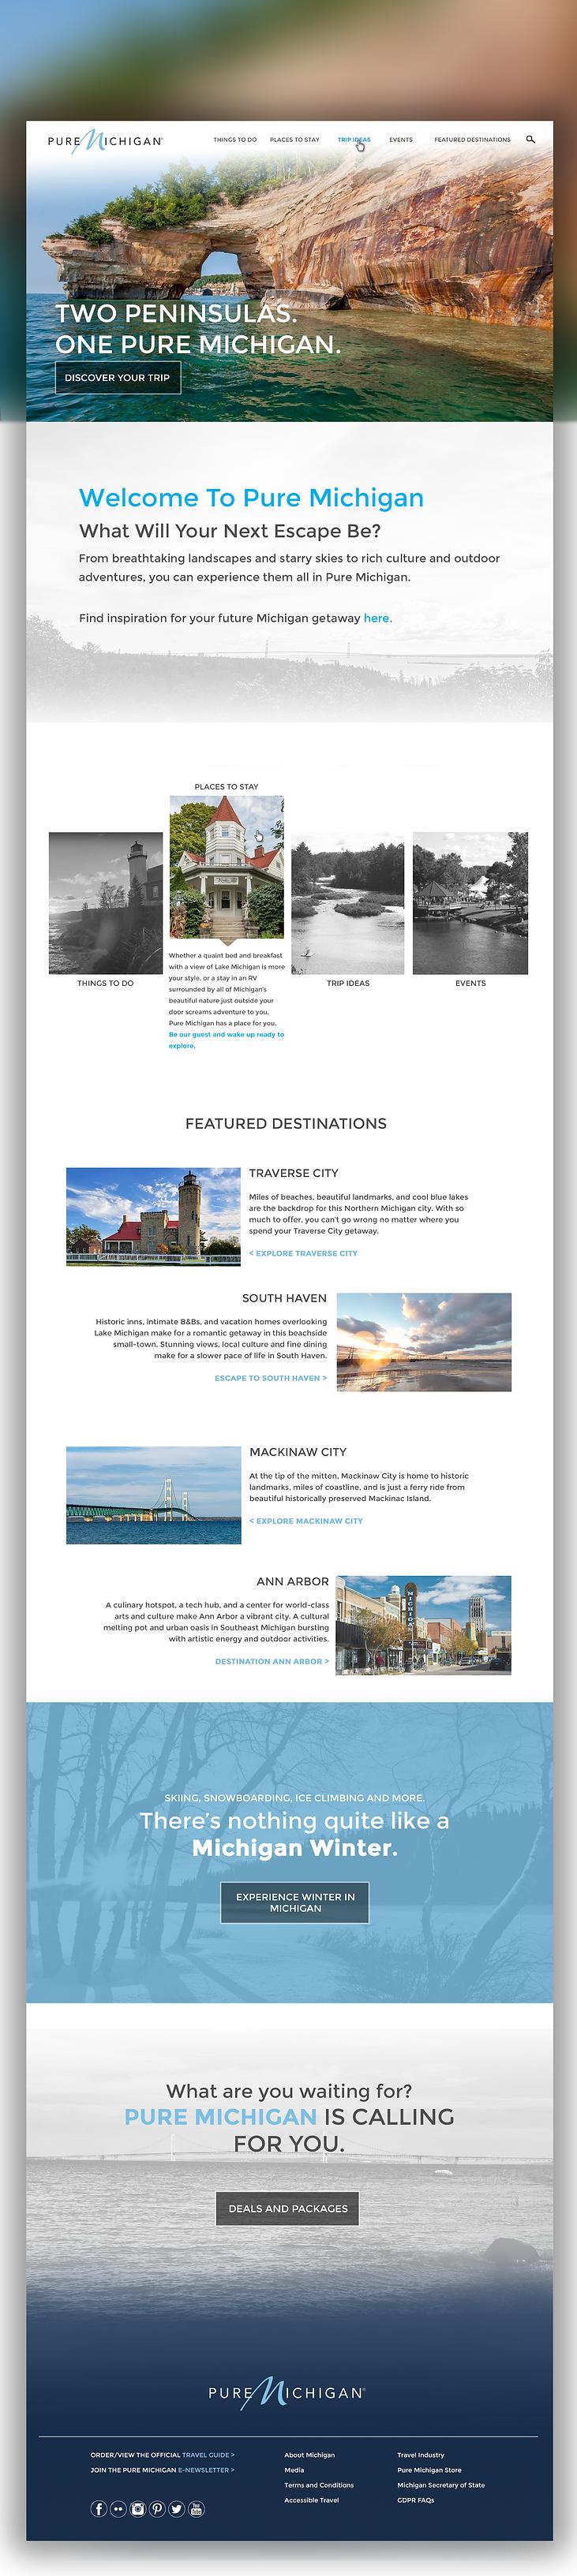 Pure Michigan Website Redesign Concept